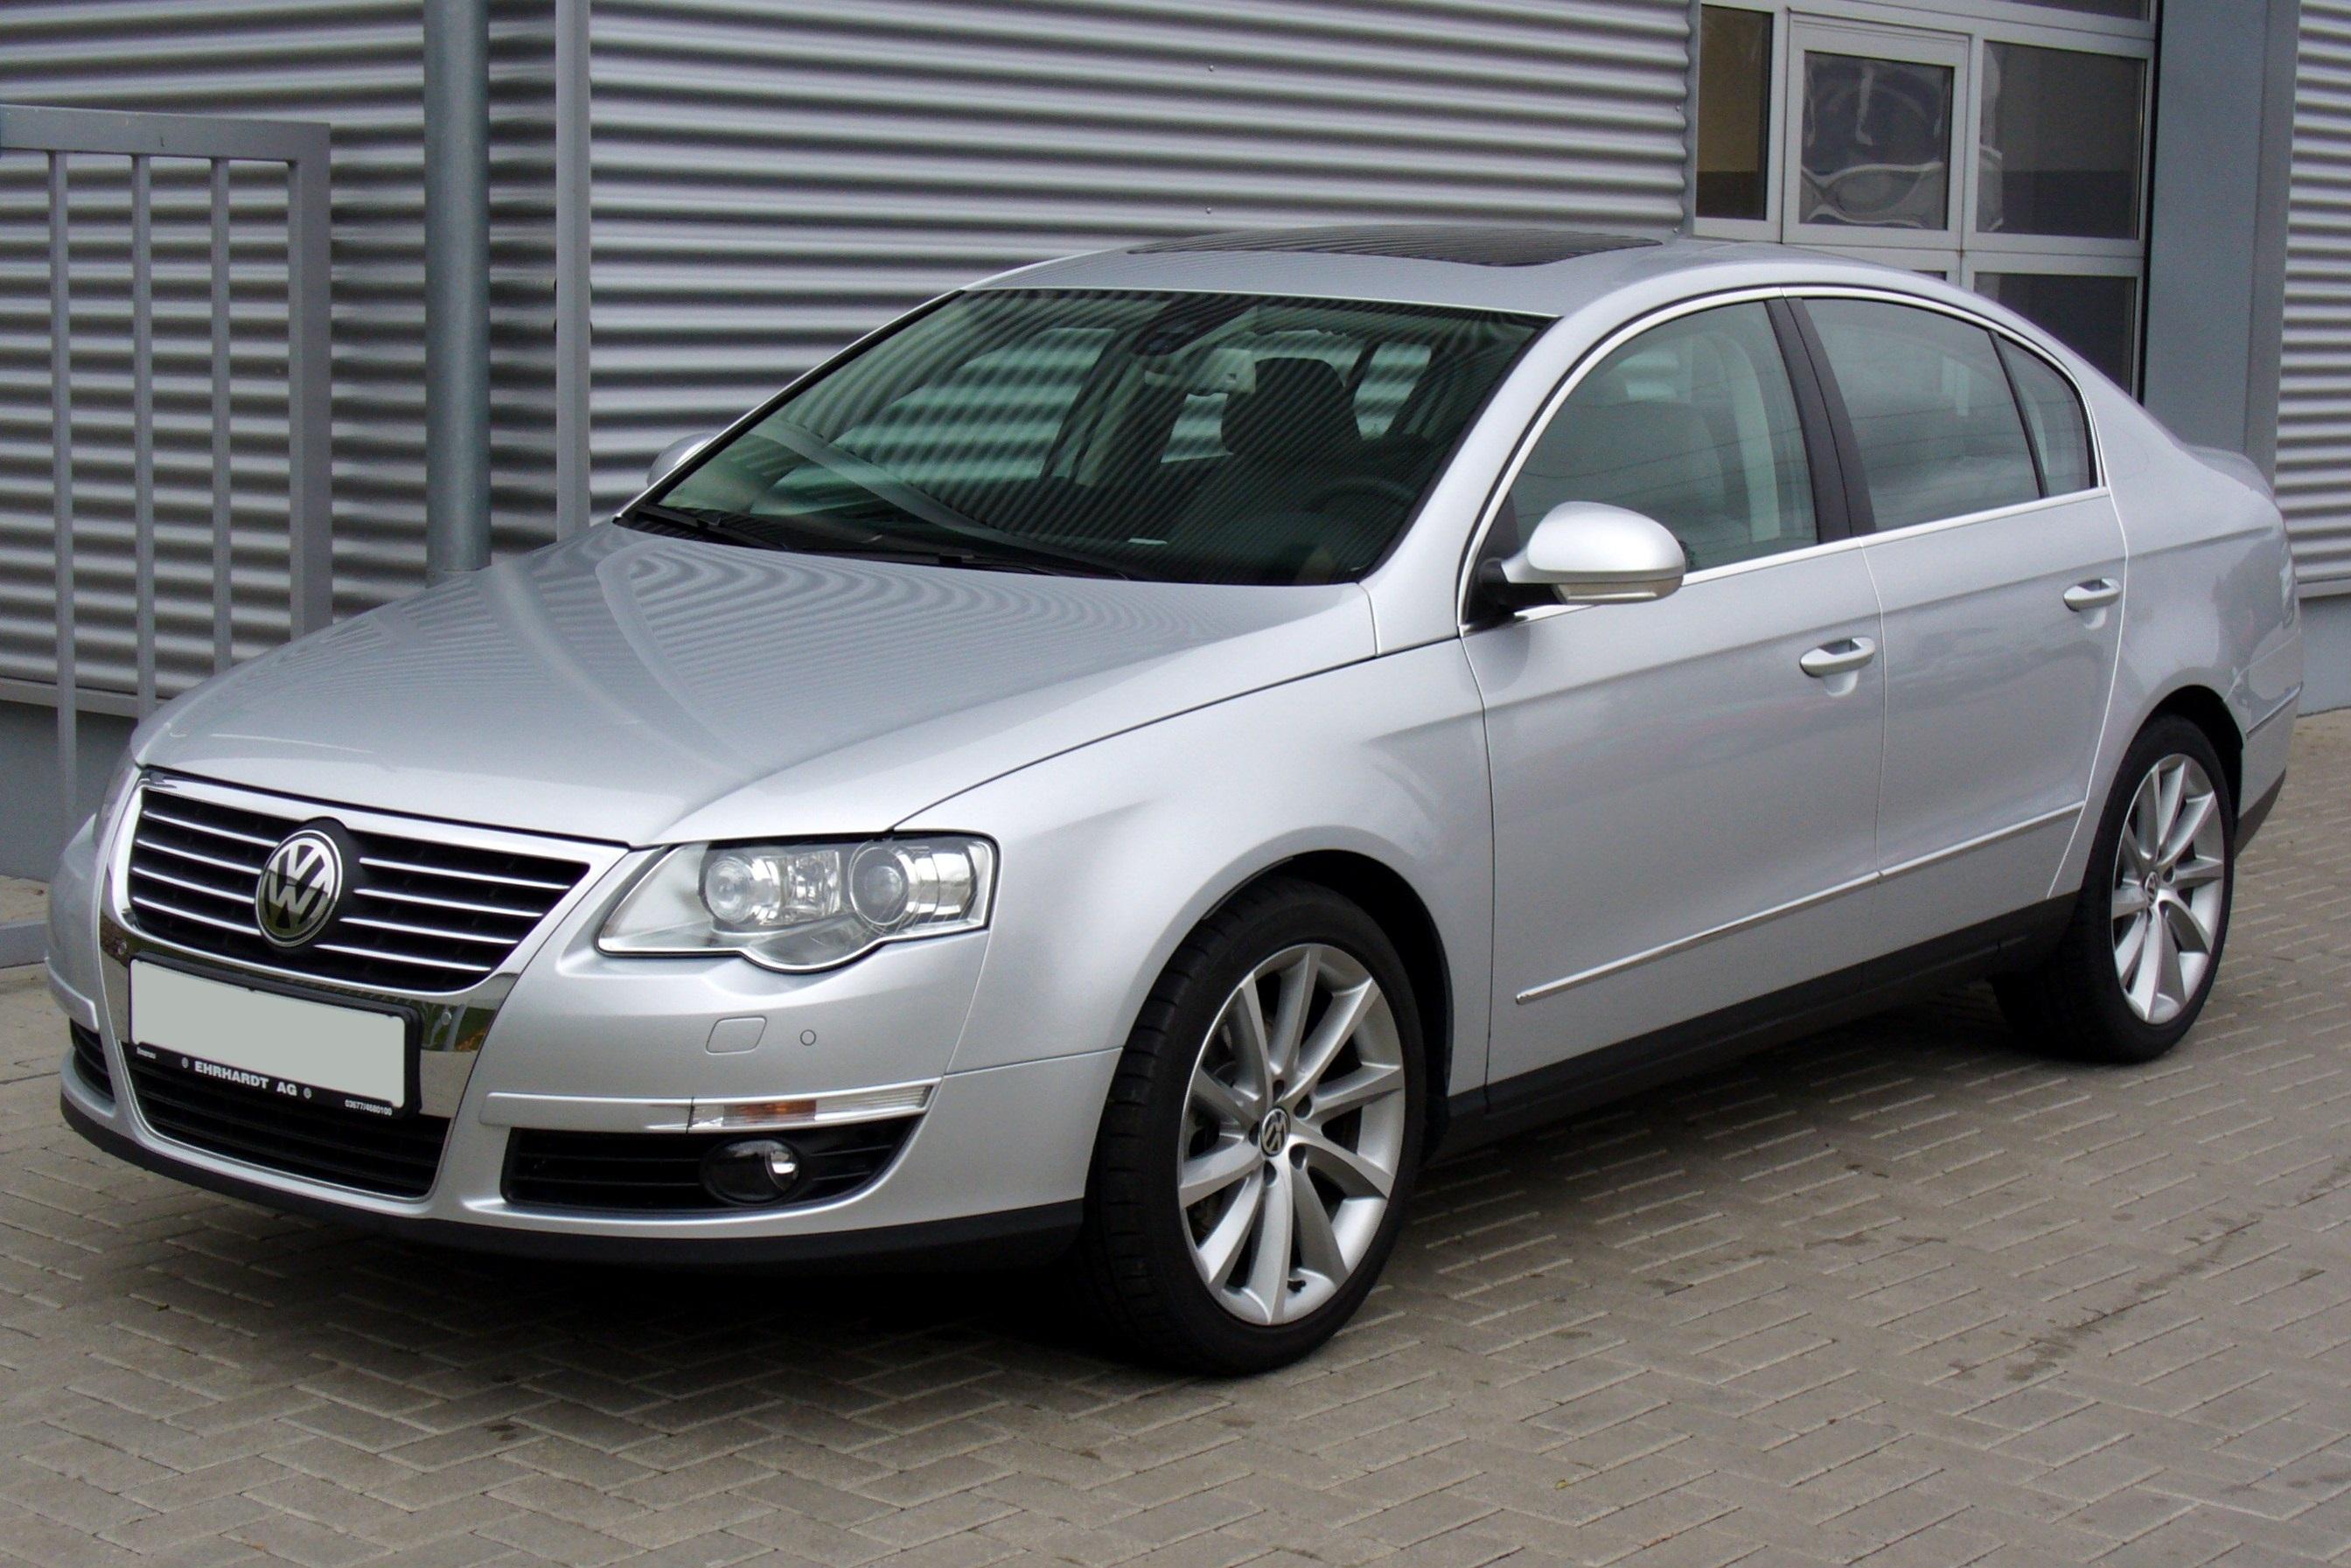 VW Passat B6 –